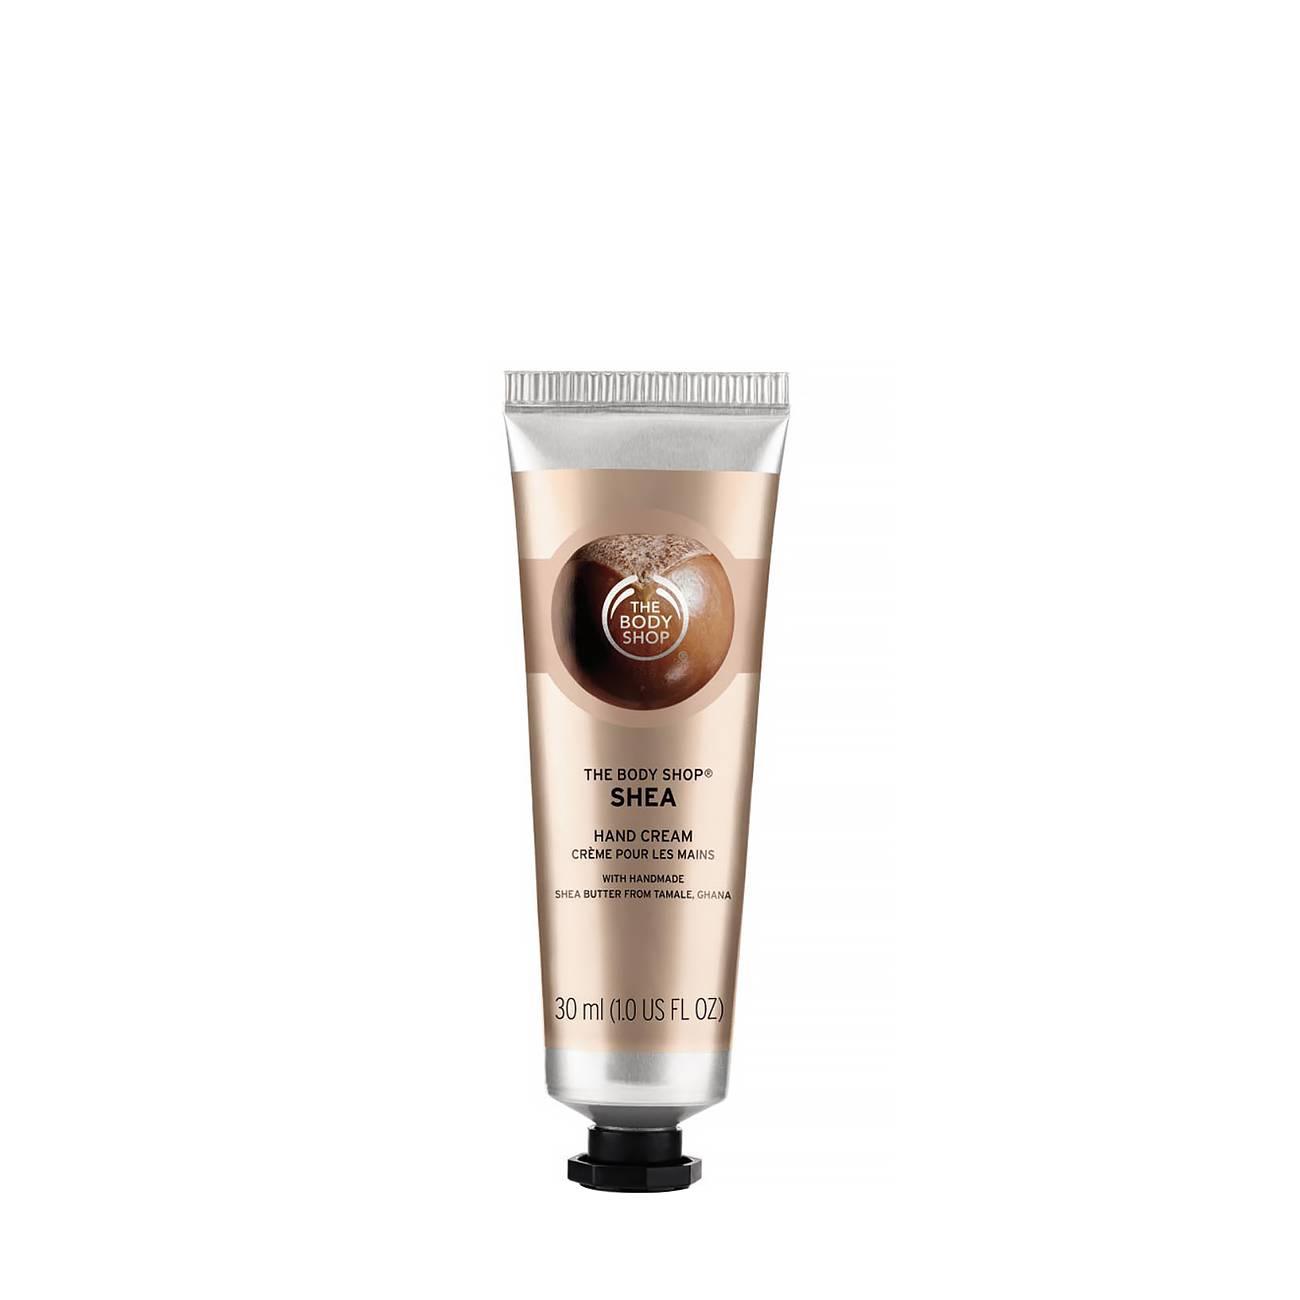 Shea Hand Cream 30ml The Body Shop imagine 2021 bestvalue.eu